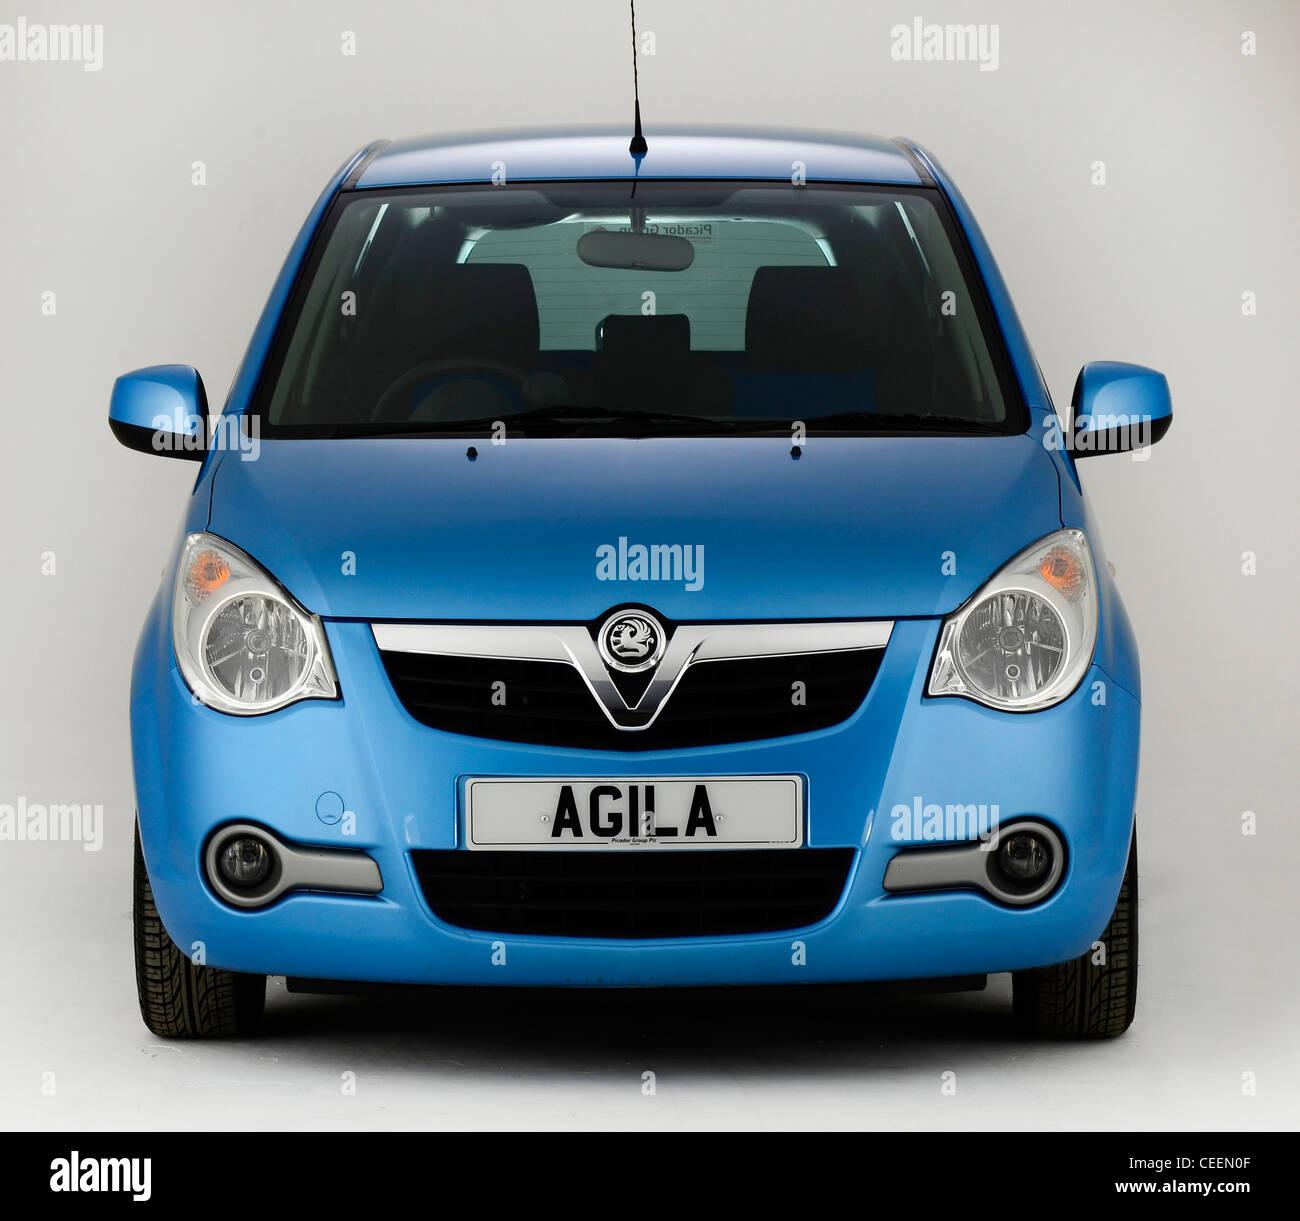 2010 Vauxhall Agila Immagini Stock